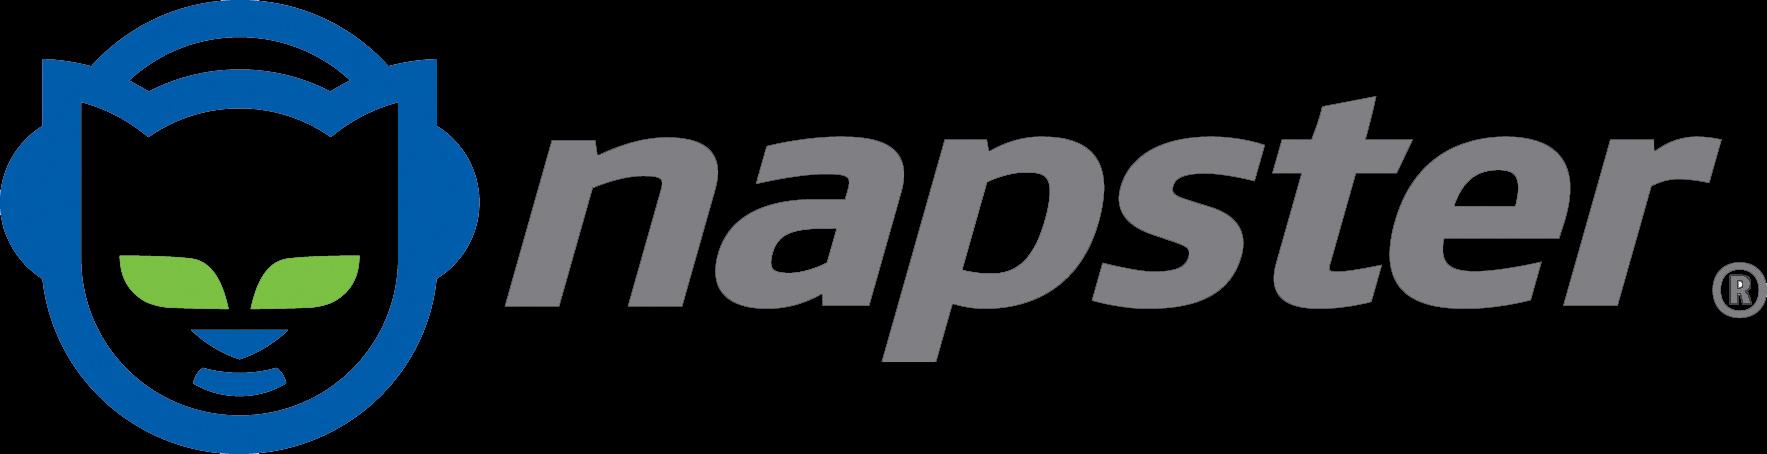 Napster Logo Large - Napster, Transparent background PNG HD thumbnail